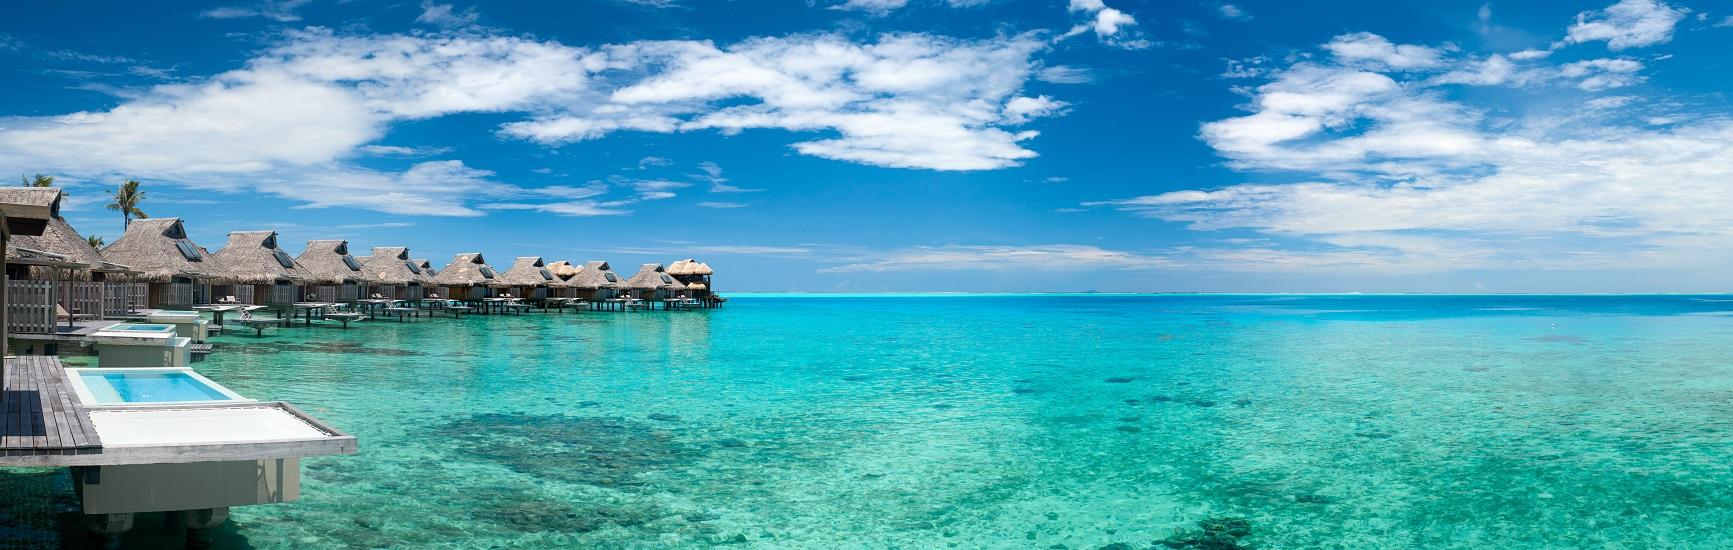 https://tahititourisme.fr/wp-content/uploads/2017/09/HERBERGEMENT-Conrad-Bora-Bora-Nui-3.jpg